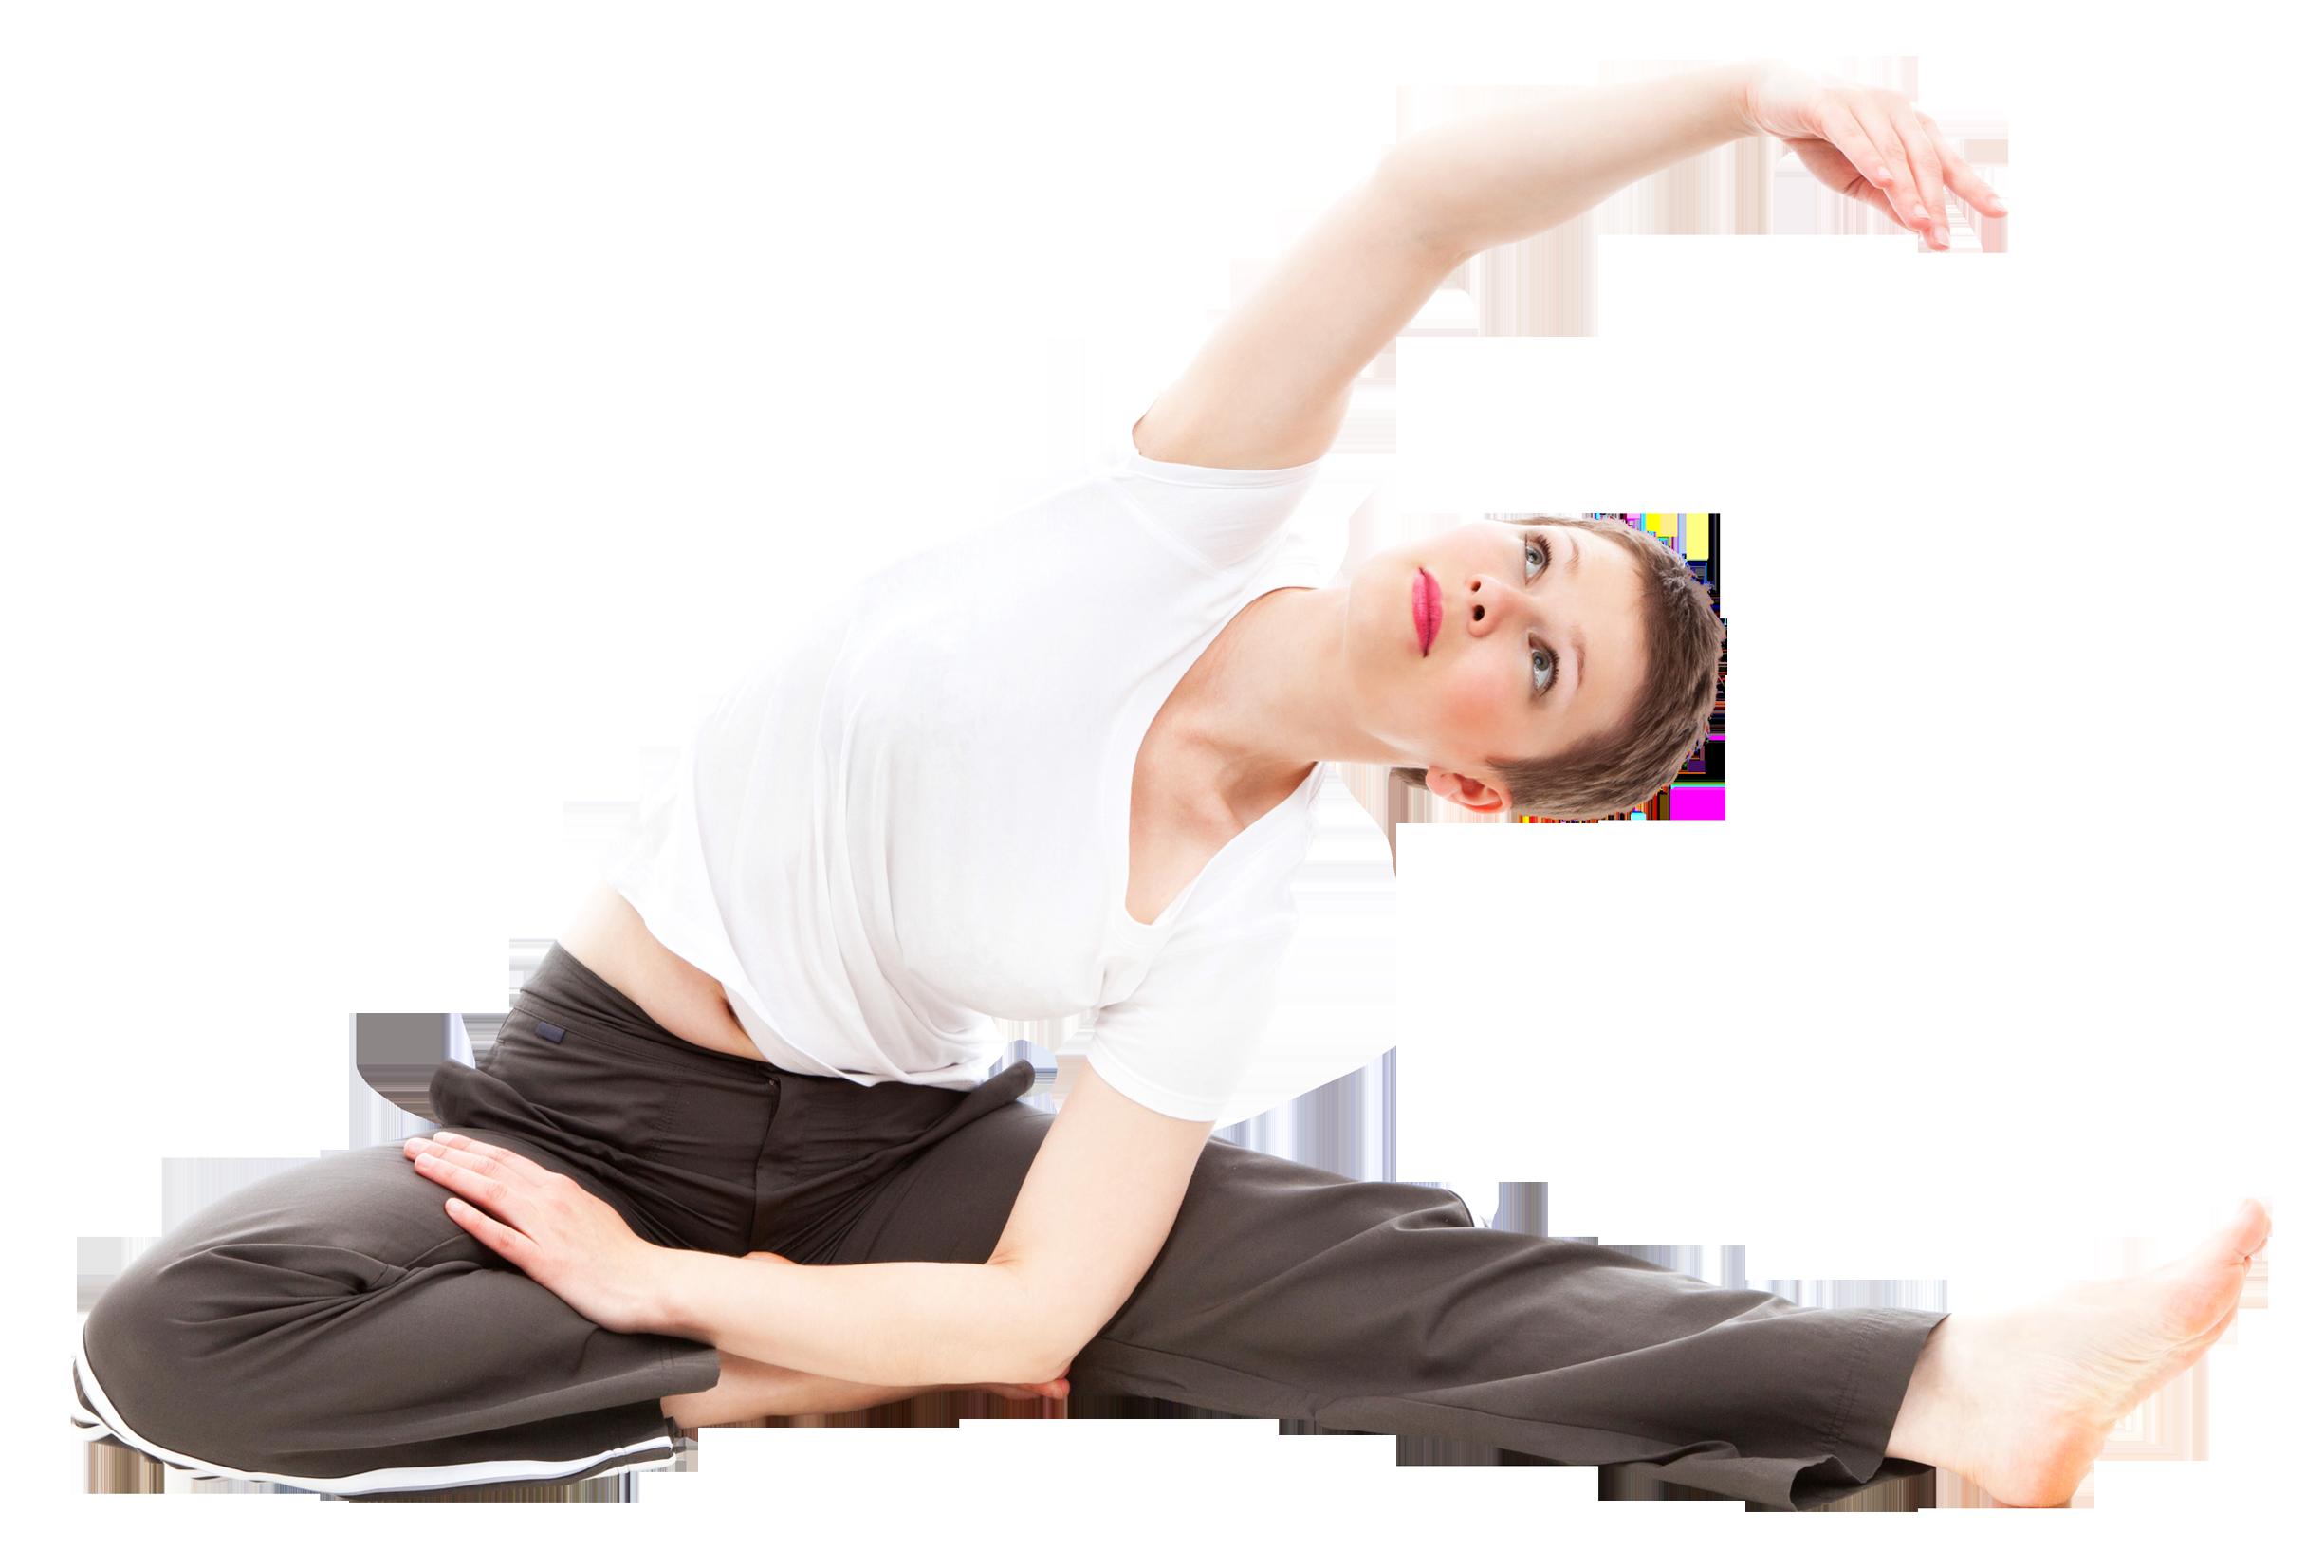 Happy Woman Doing Yoga PNG Image - Yoga PNG